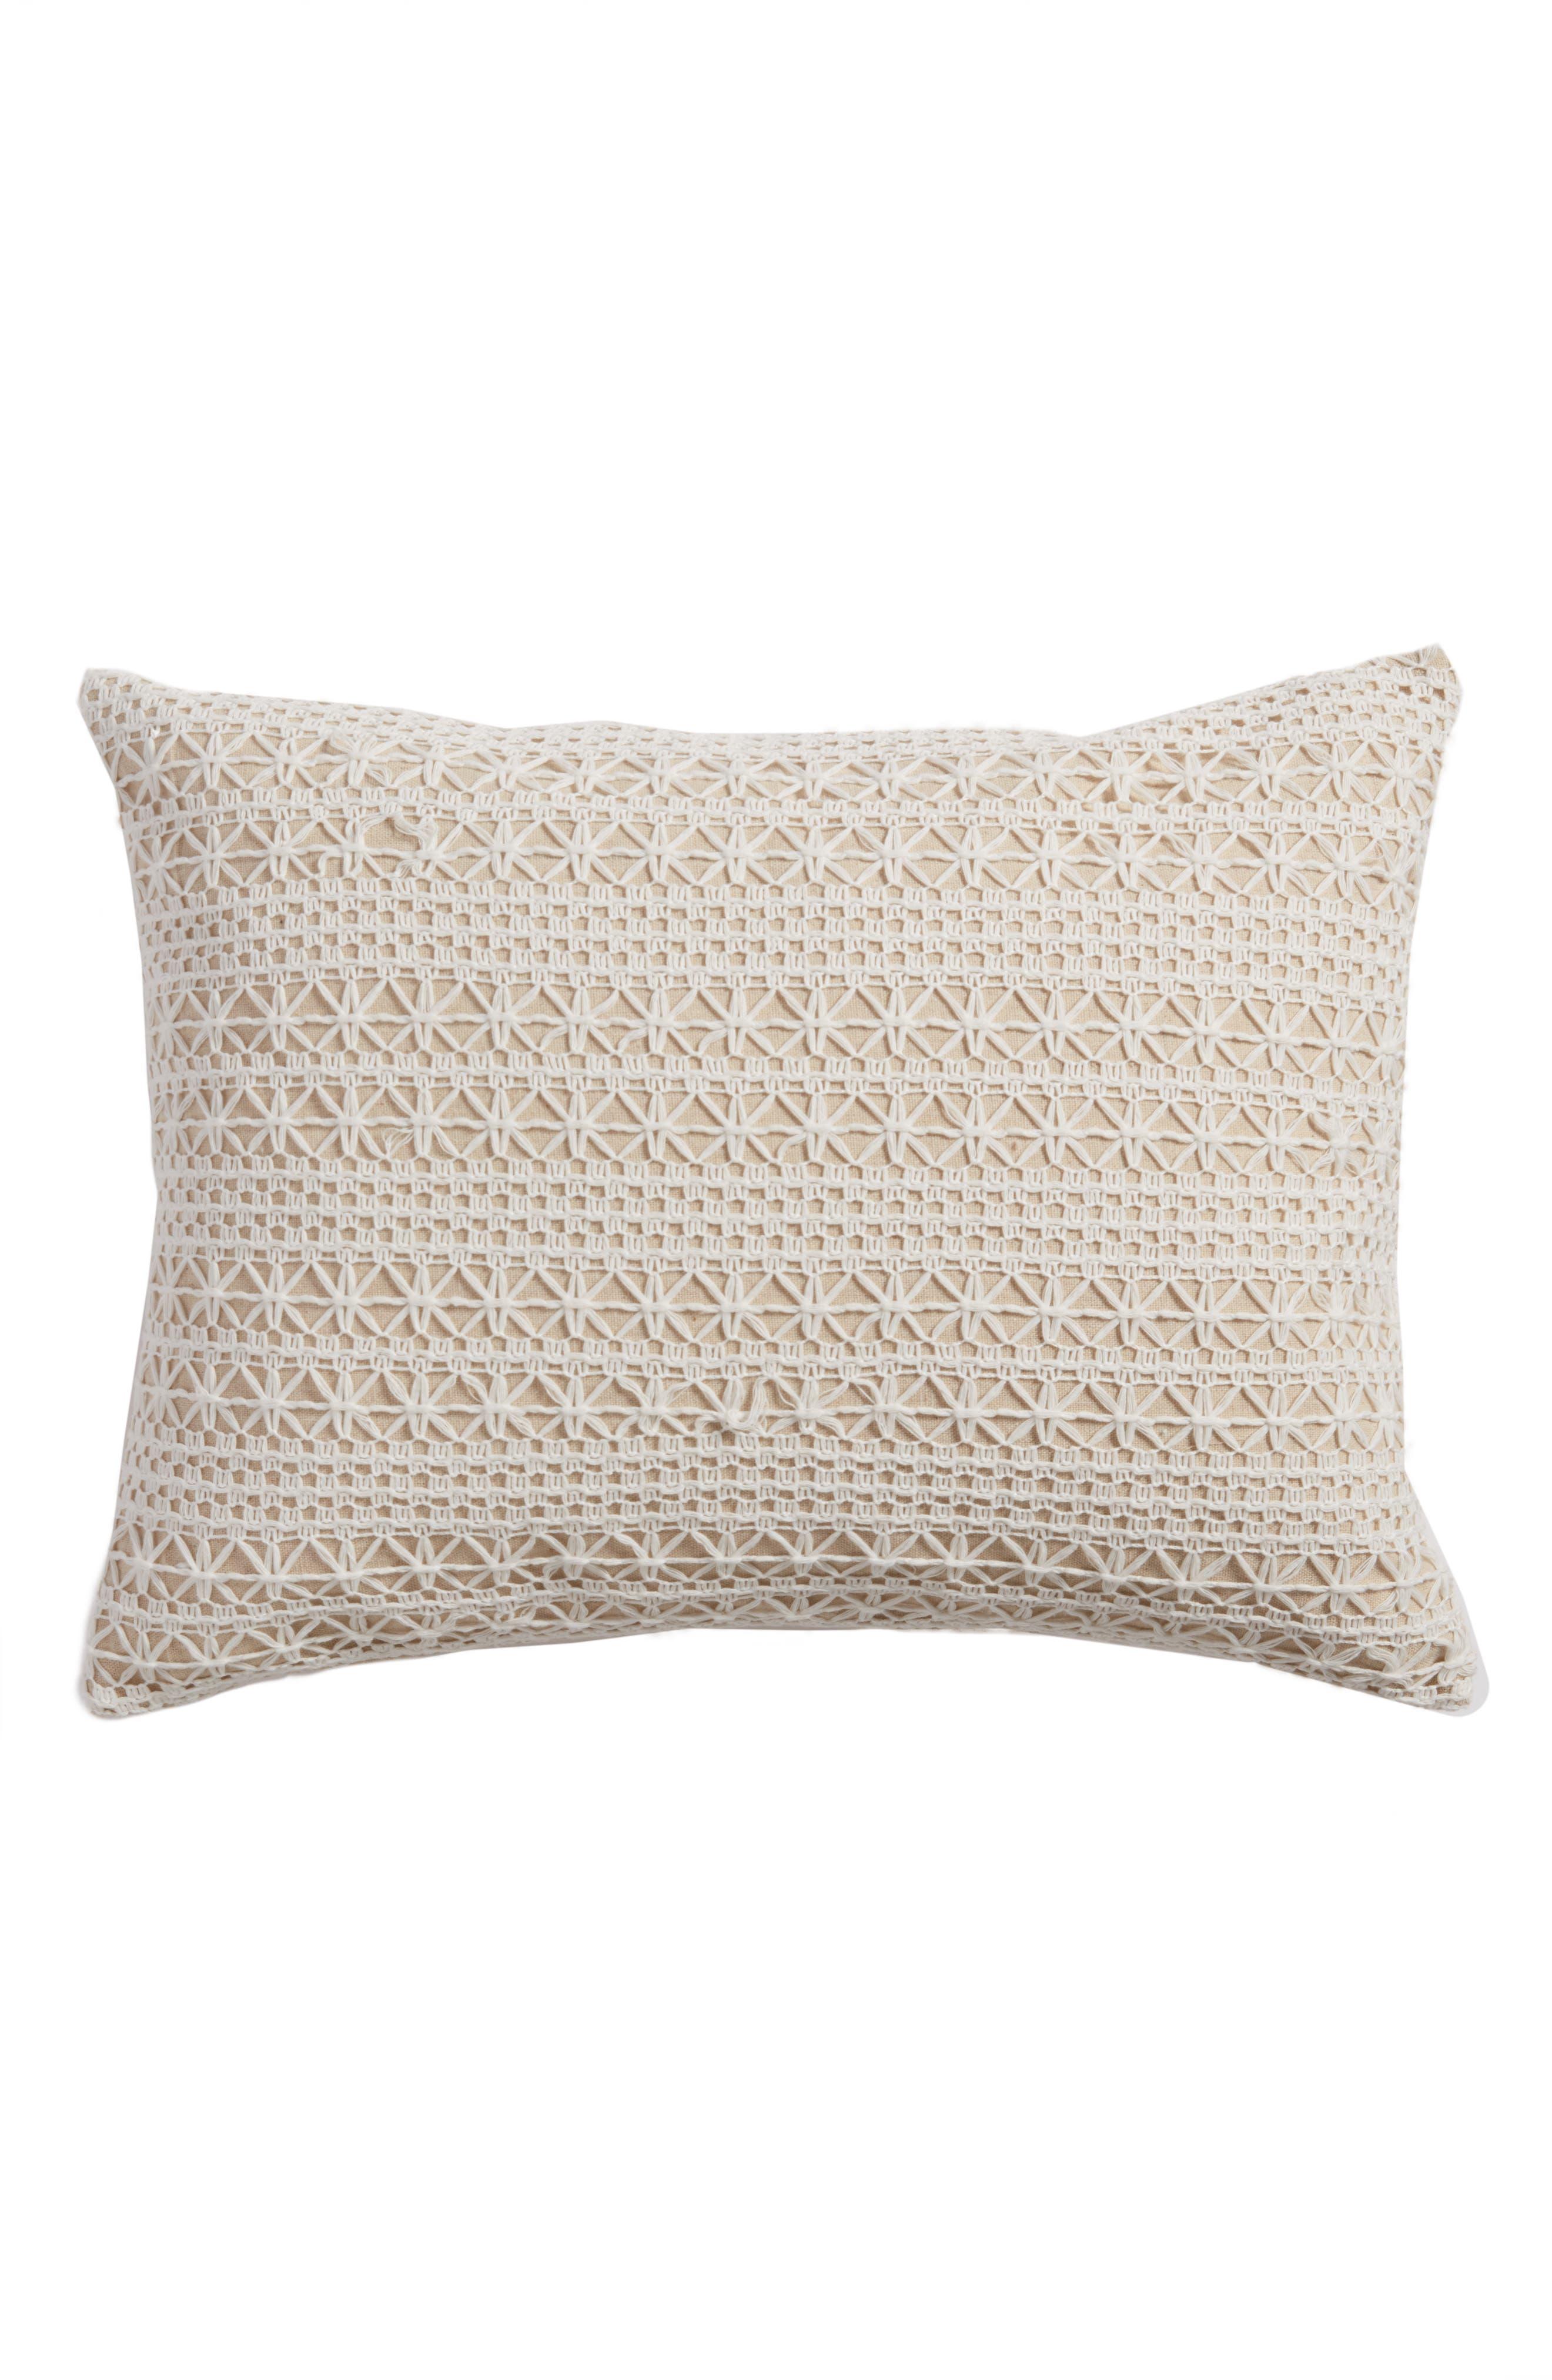 Arden Accent Pillow,                         Main,                         color, Cream